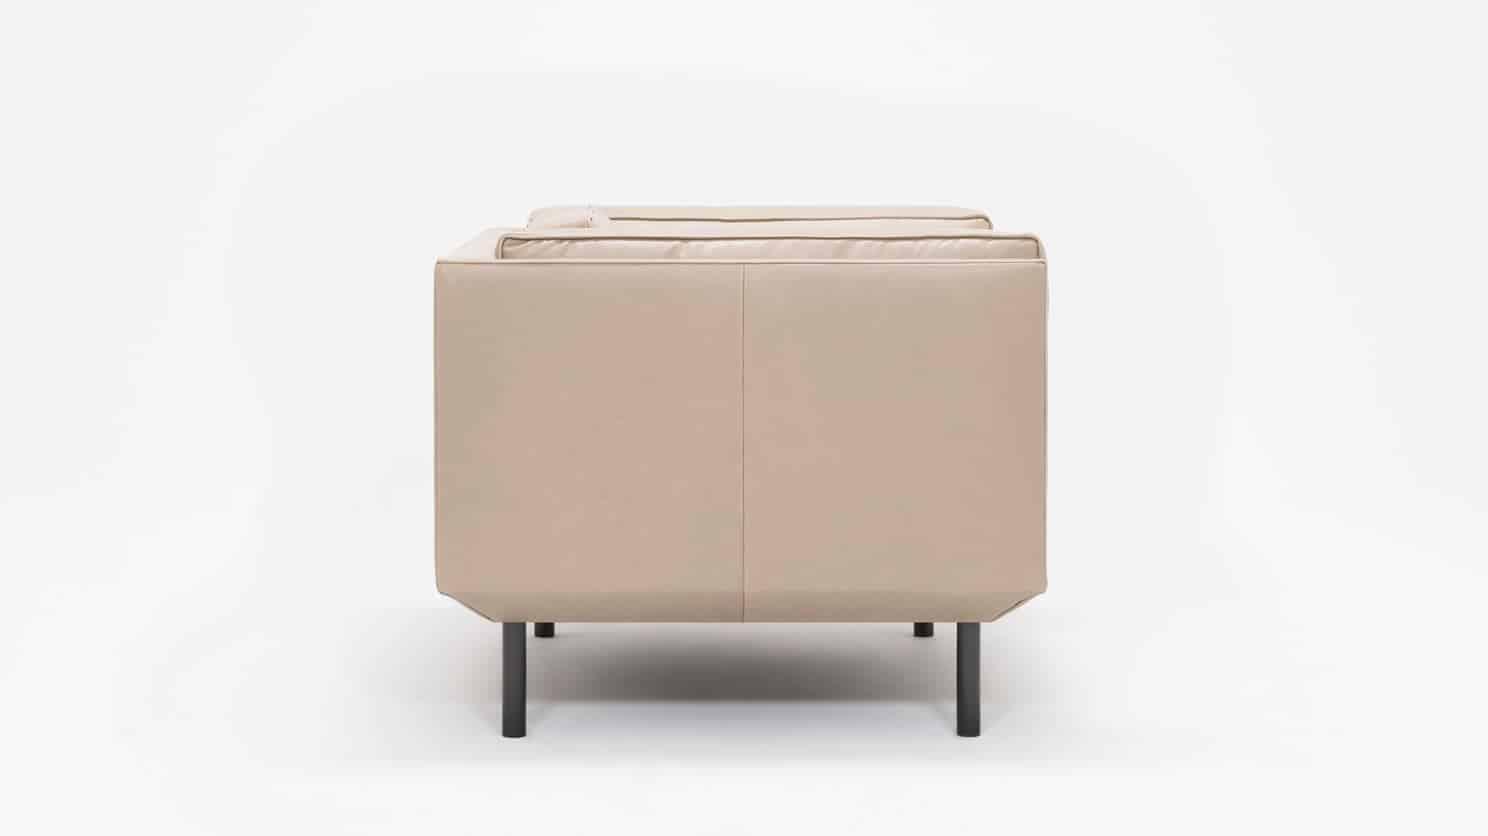 37154 02 4 chairs plateau chair feather coachella warm grey side 01